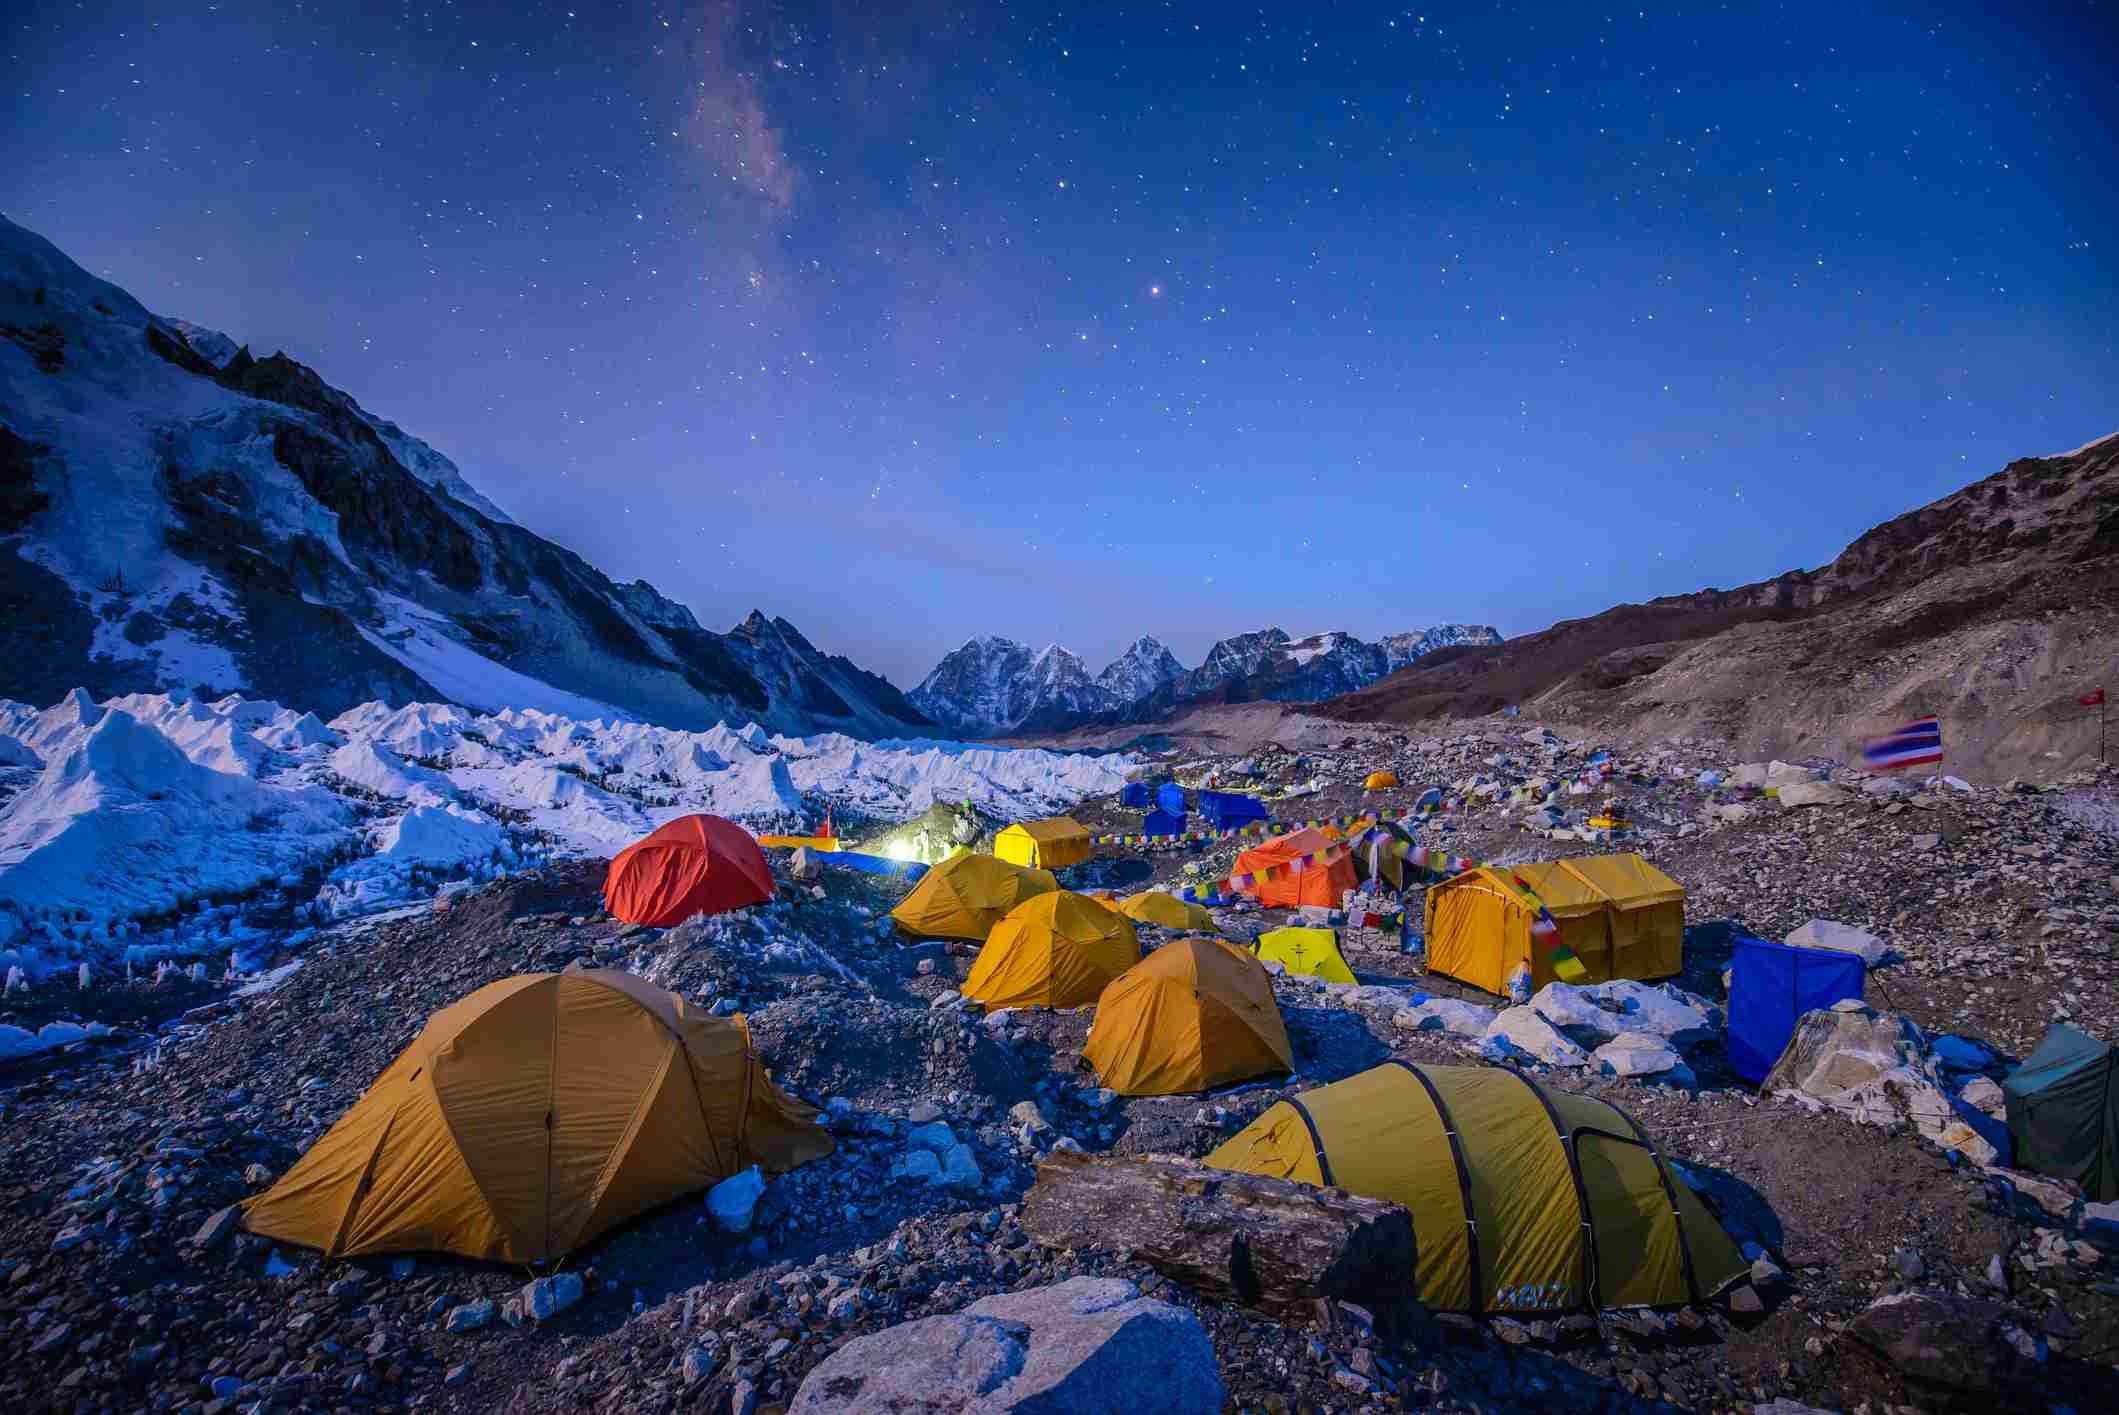 Tents beneath stars at Everest Base Camp, Nepal